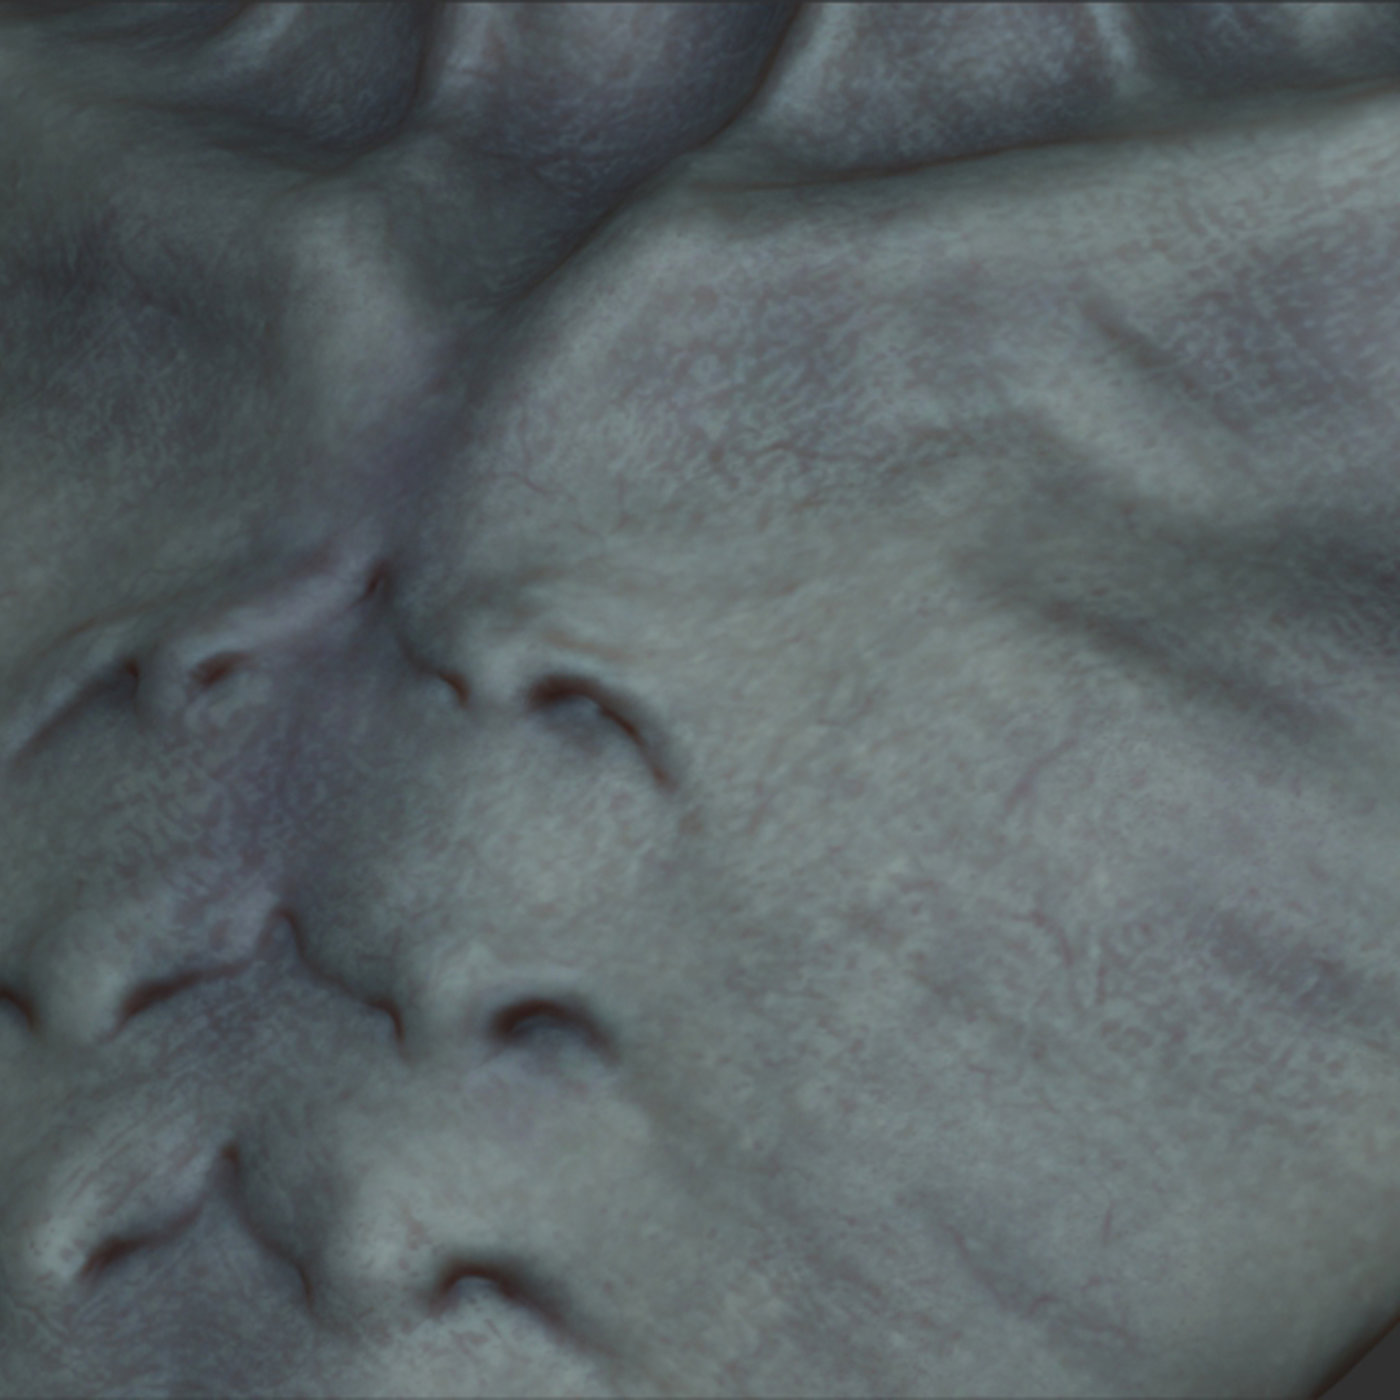 Alien inspired by JorduChell work